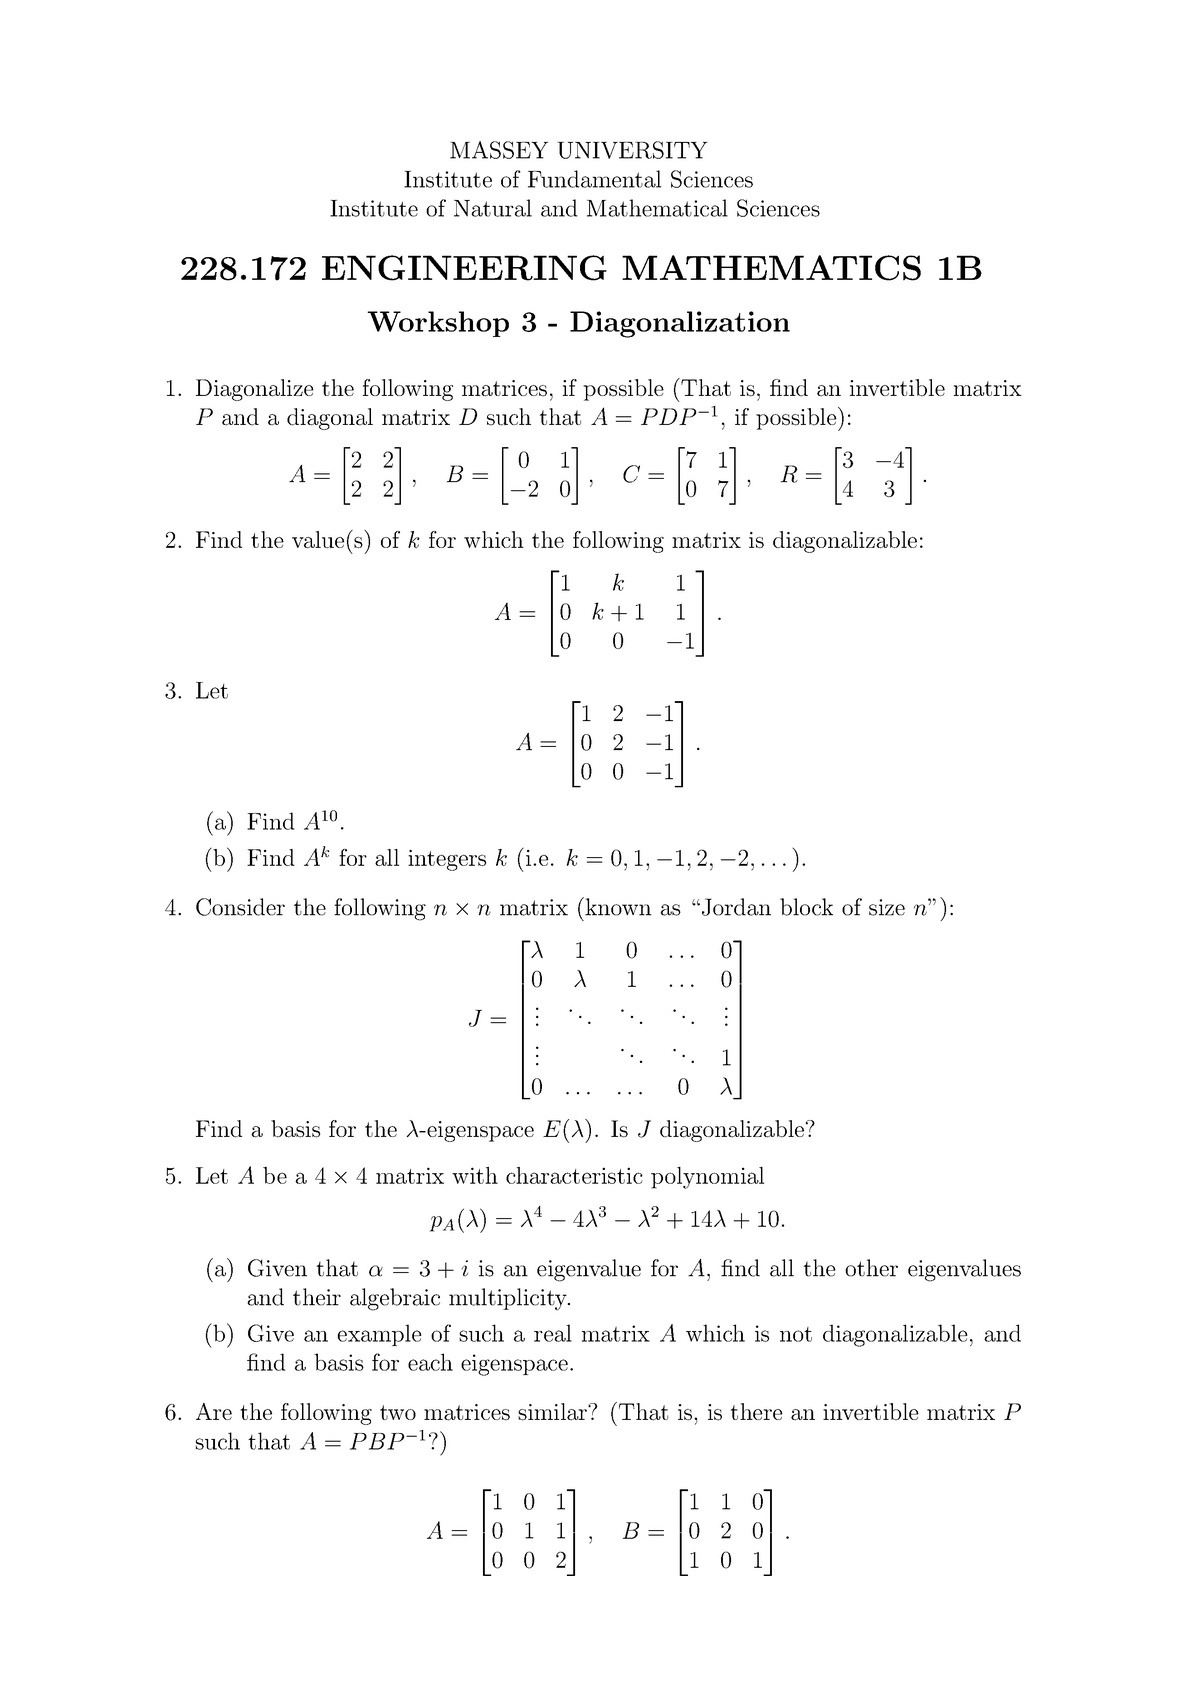 228172-W03-Diagonalization - Engineering Mathematics 228 171